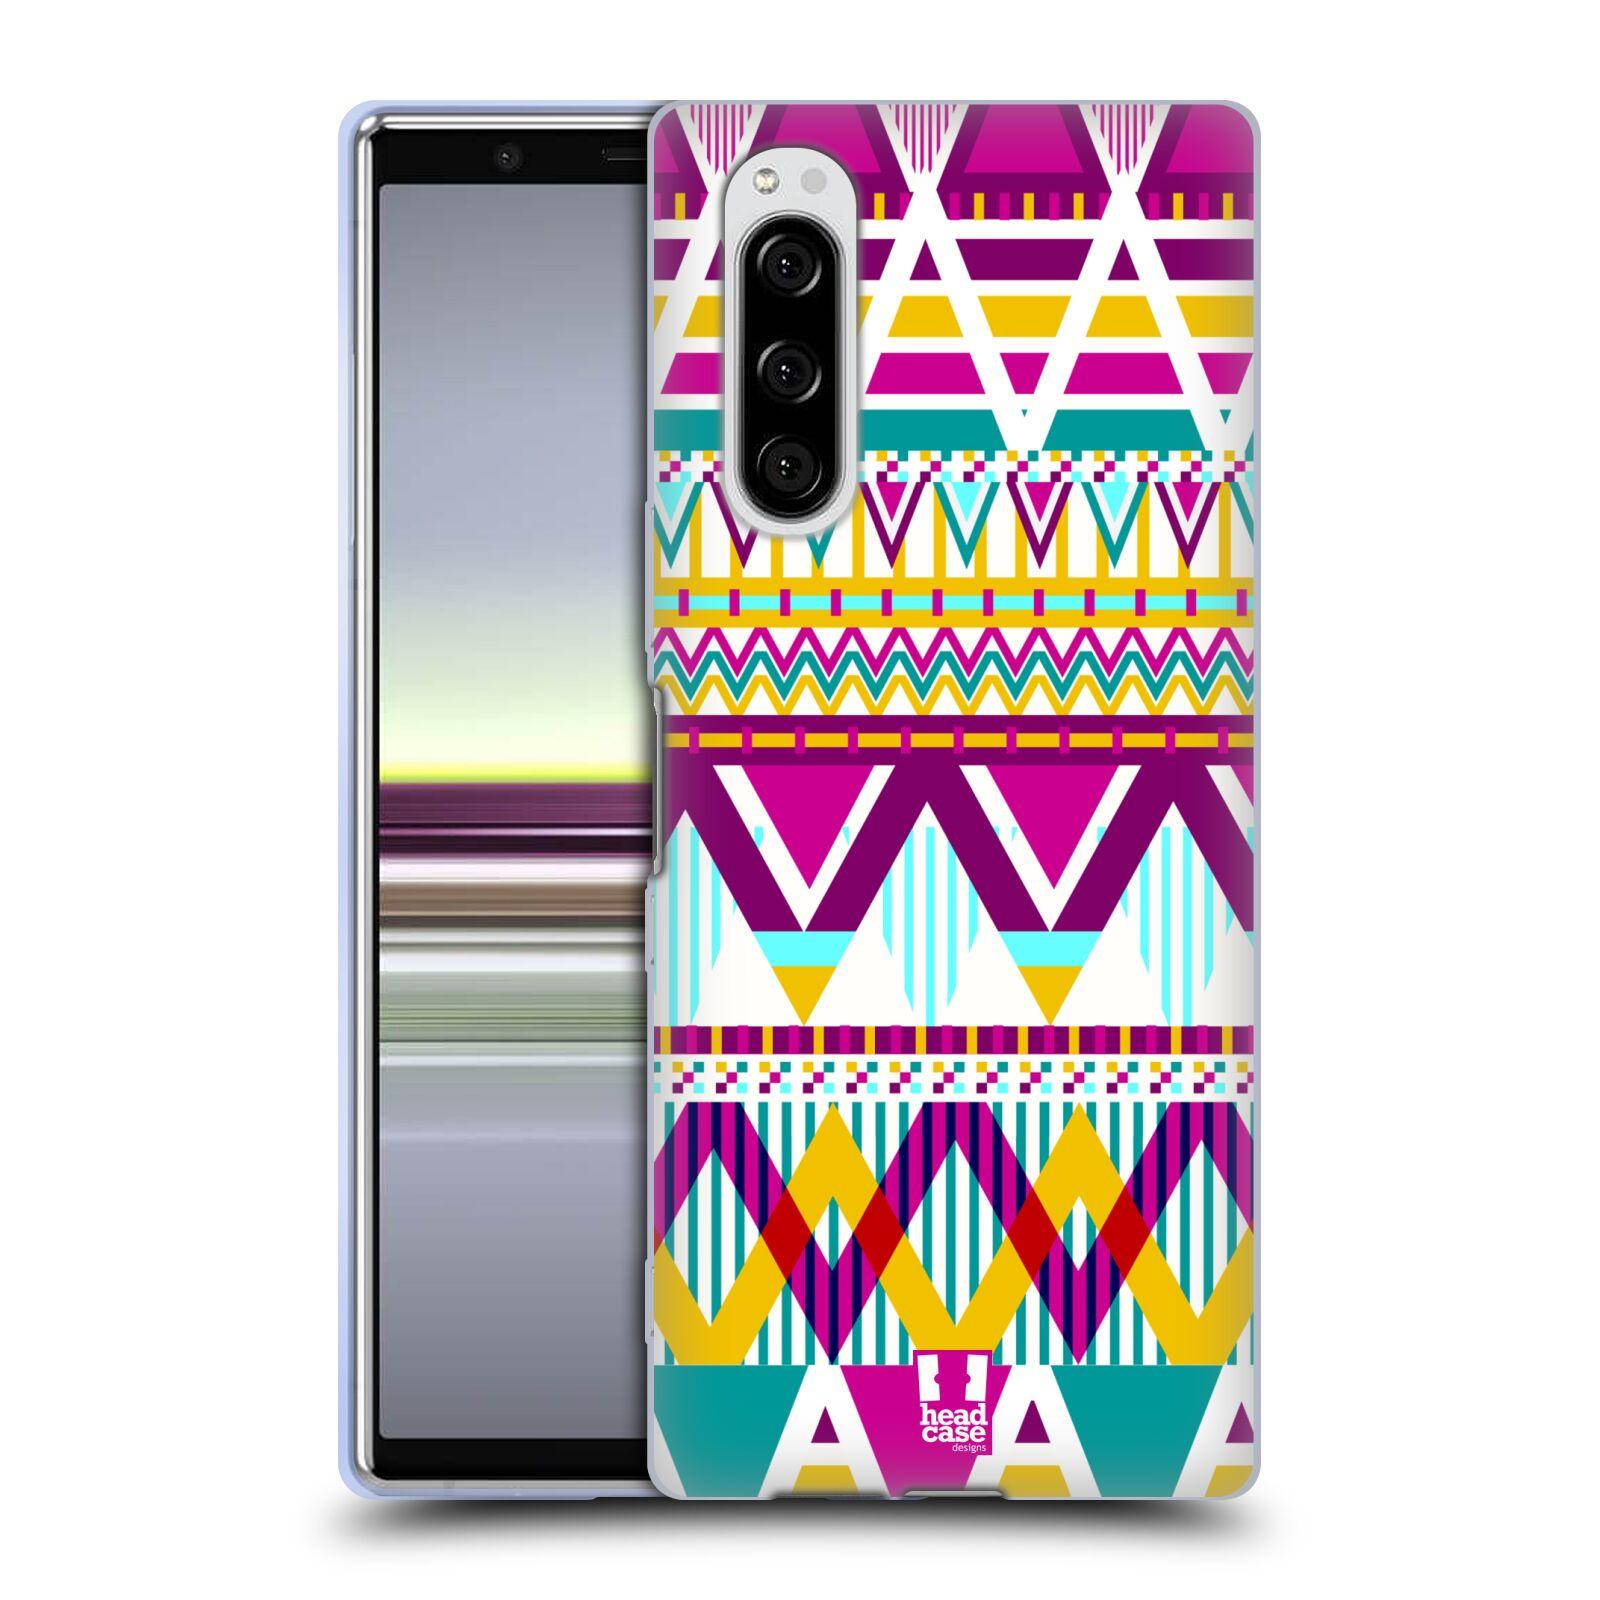 Silikonové pouzdro na mobil Sony Xperia 5 - Head Case - AZTEC SUGARED